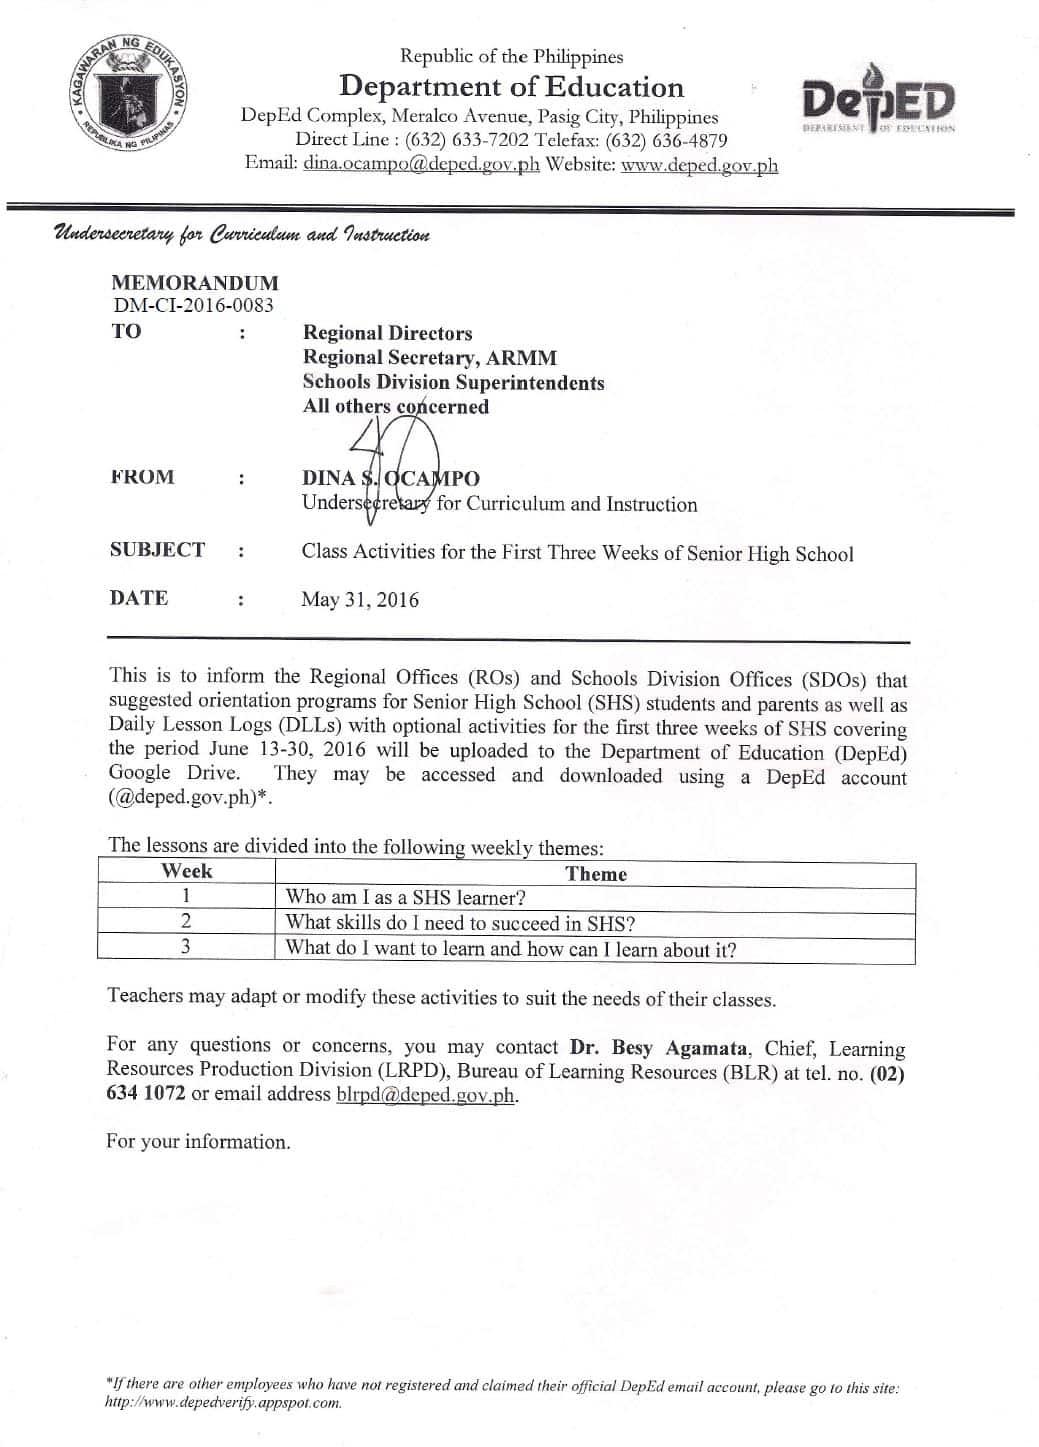 school memorandum sample